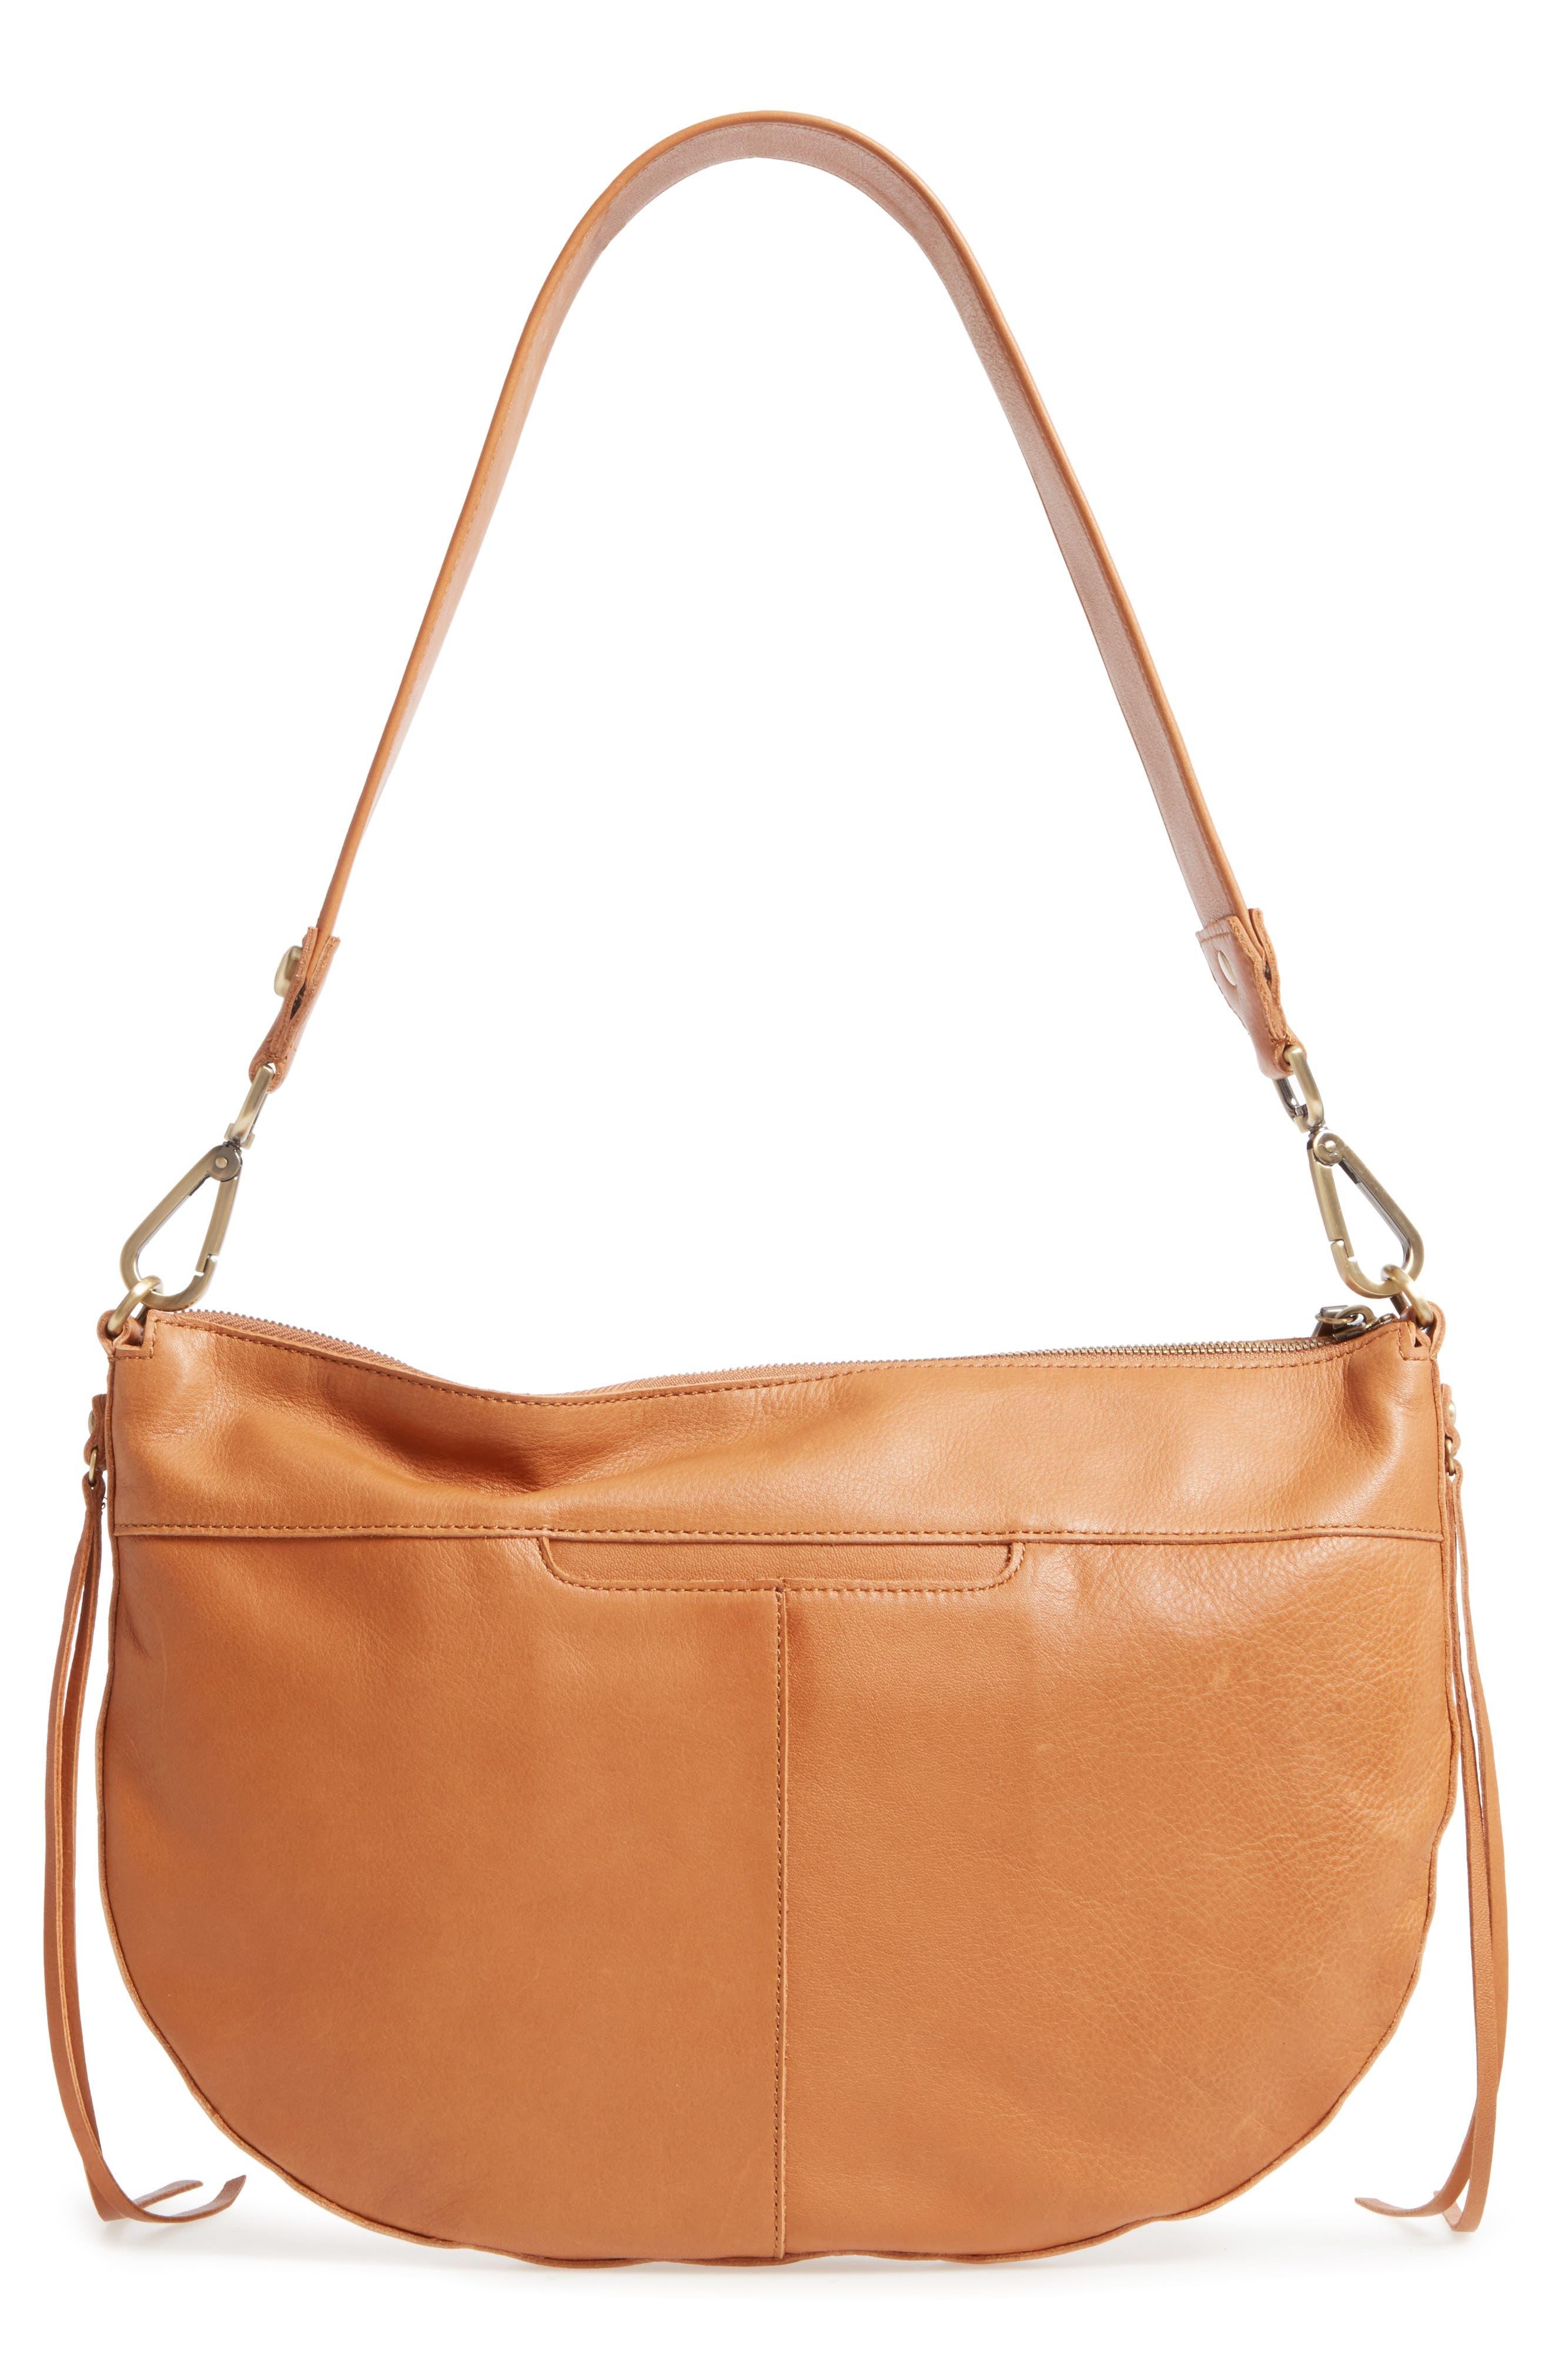 Cisco Calfskin Leather Hobo Bag,                             Alternate thumbnail 3, color,                             200